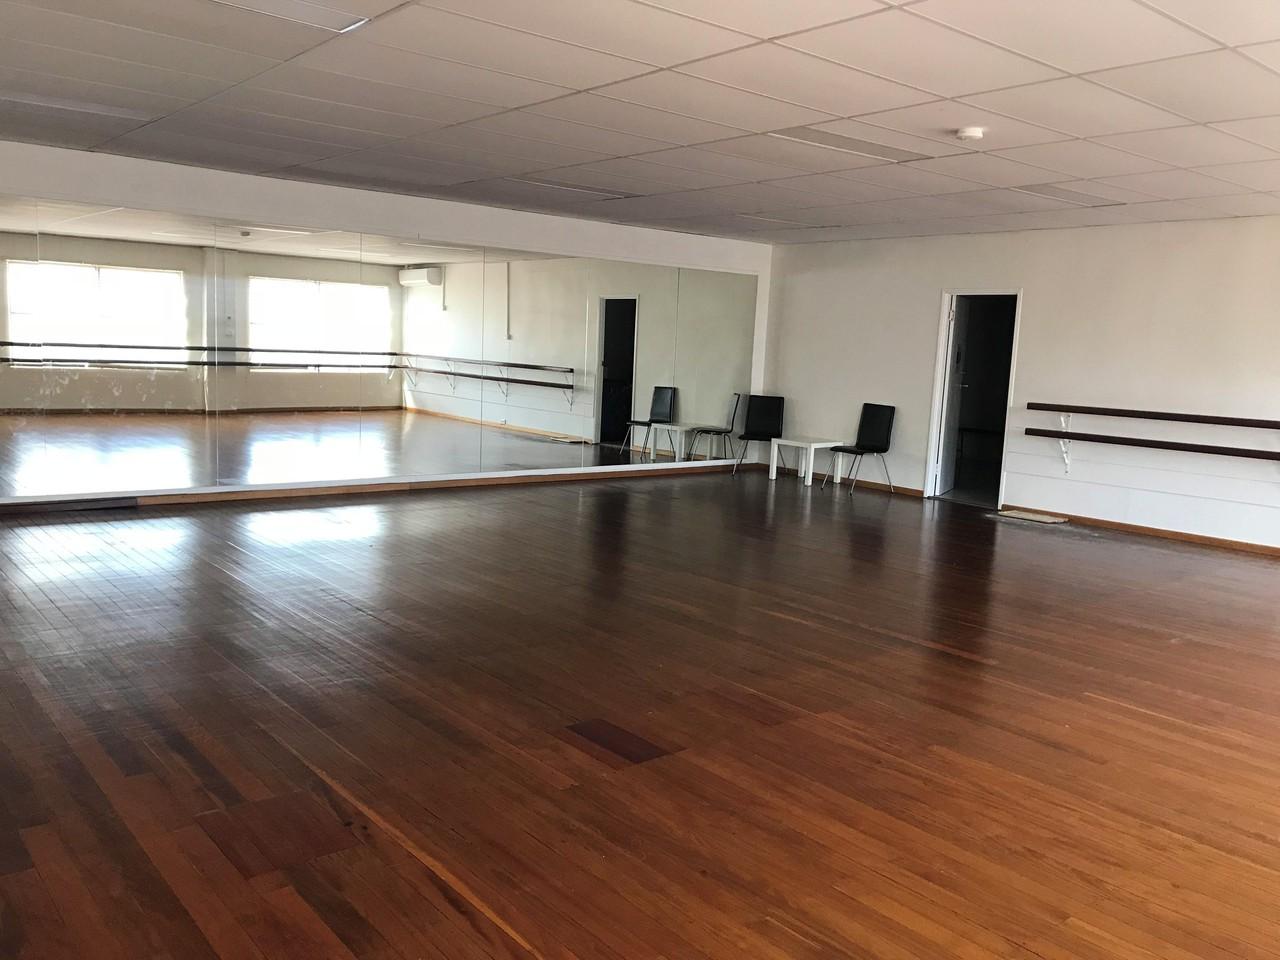 Brisbane workshop spaces Unusual Maximo Dance Studio image 0